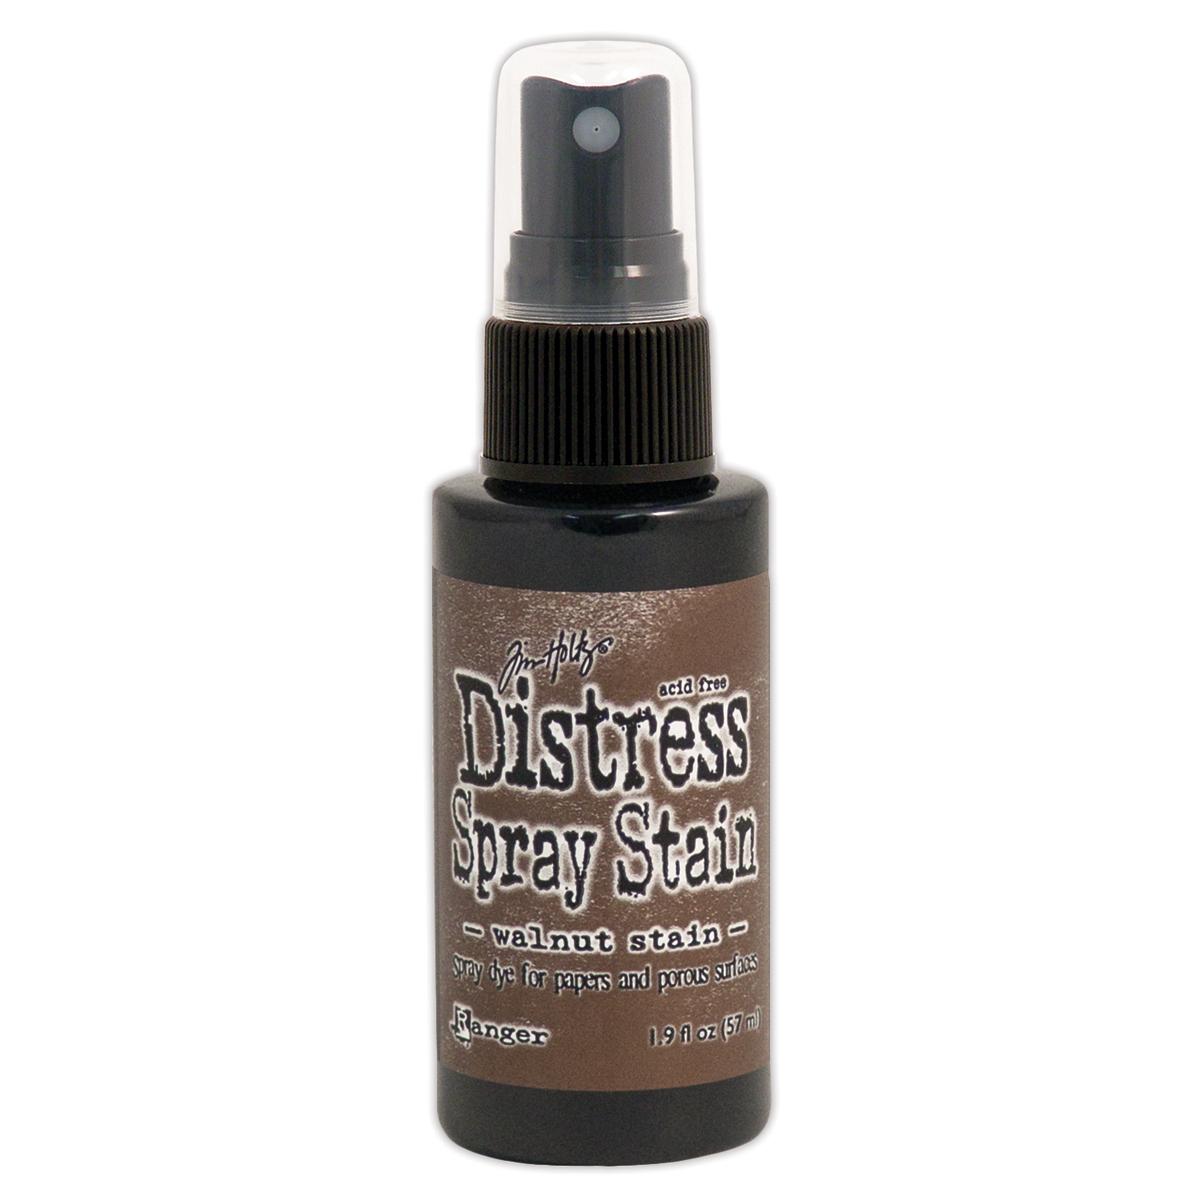 Tim Holtz Distress Spray Stain 1.9oz-Rustic Wilderness